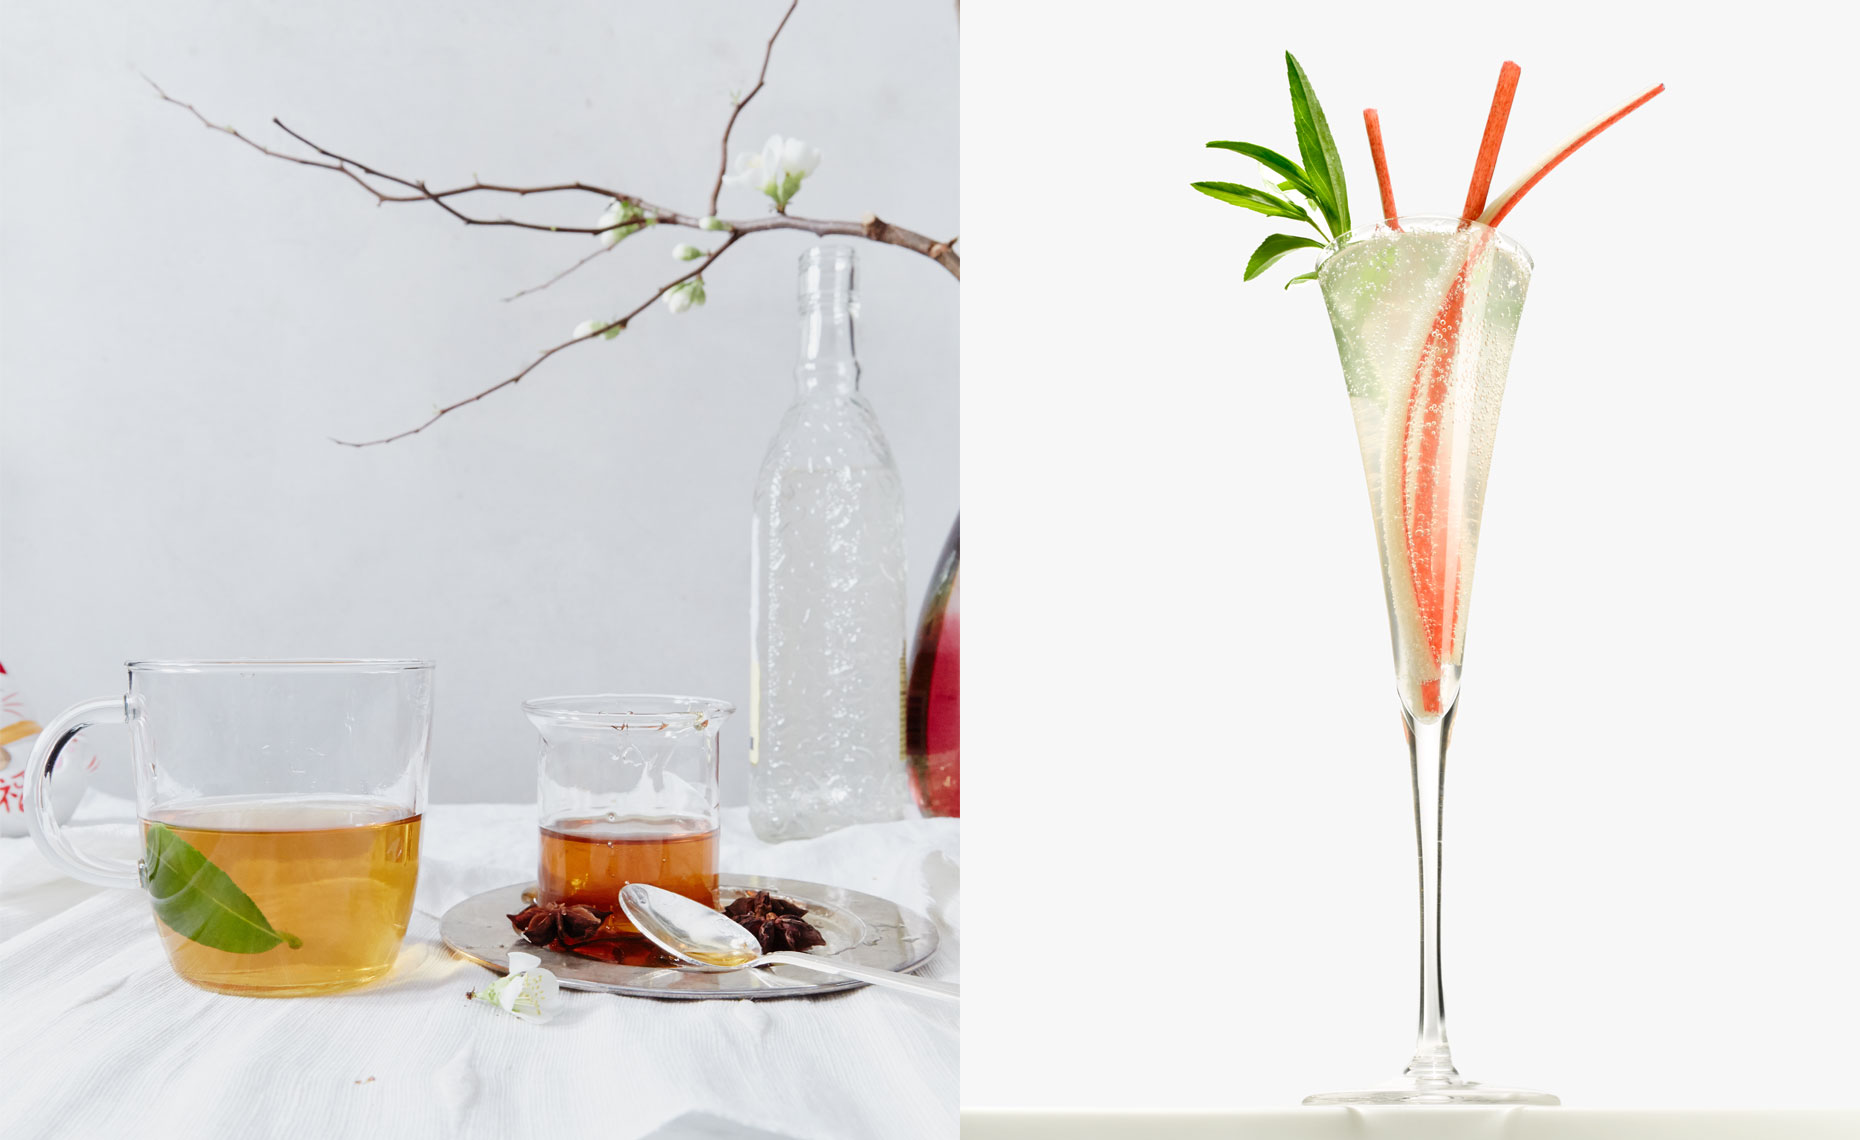 tea-and-rhubarb.jpg